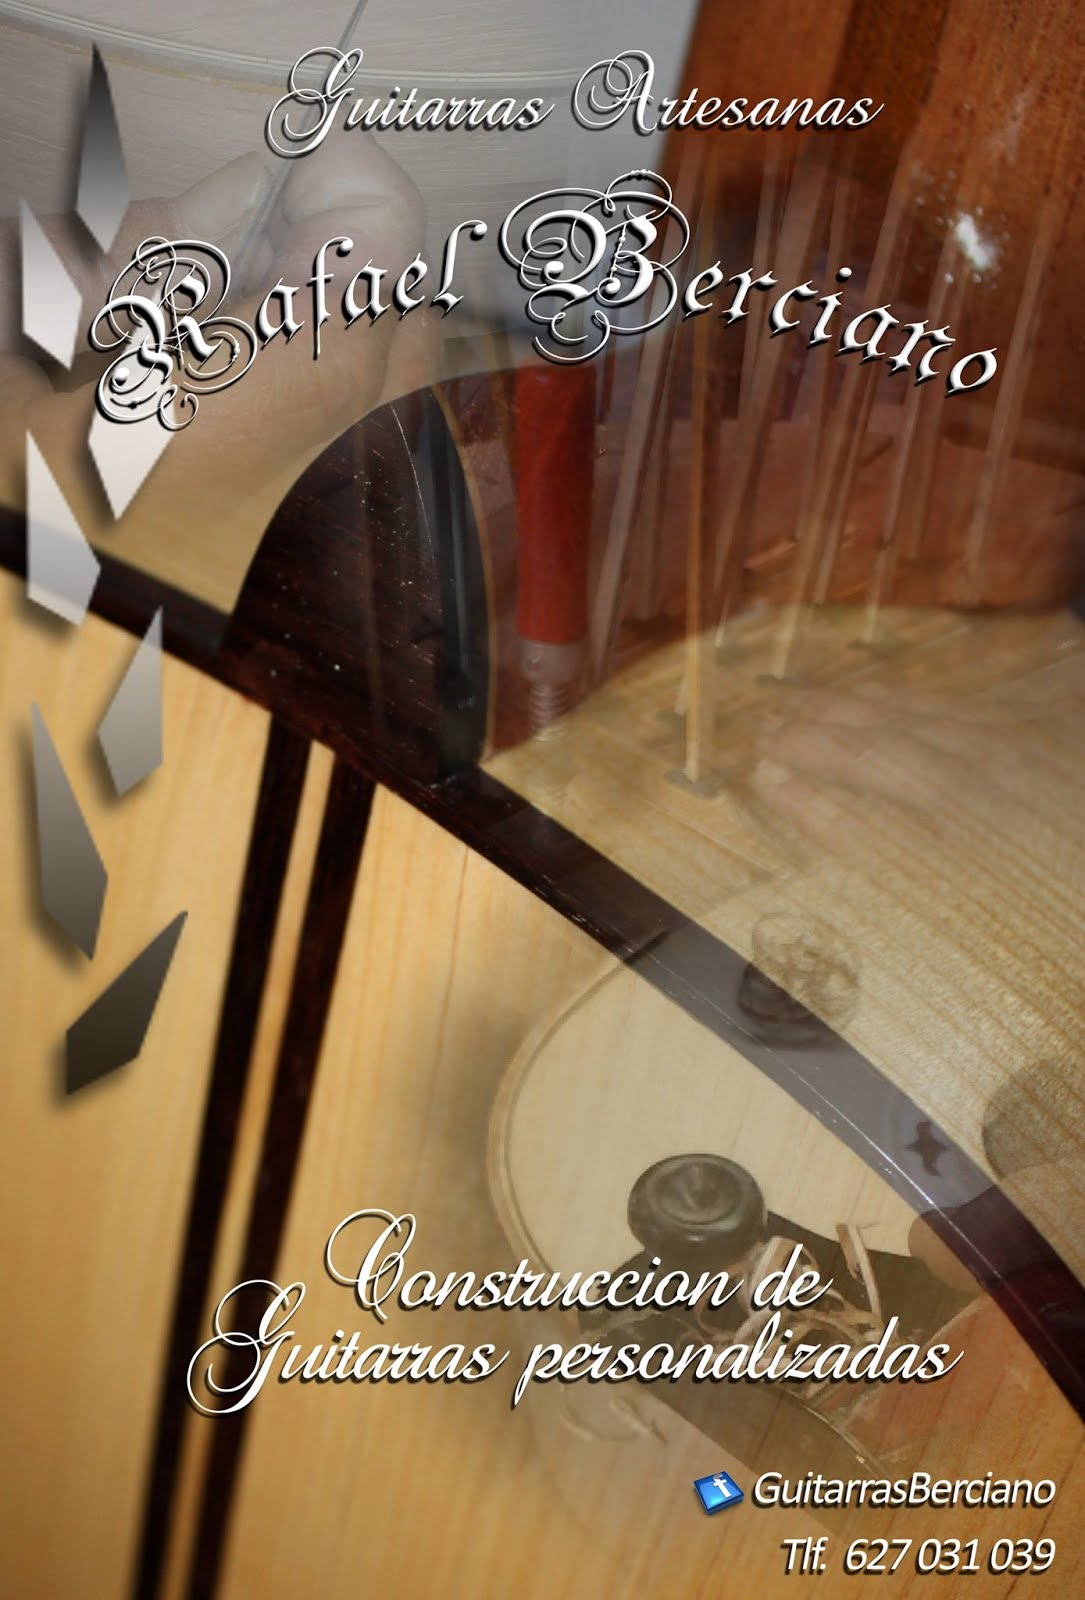 GUITARRAS ARTESANAS RAFAEL BERCIANO